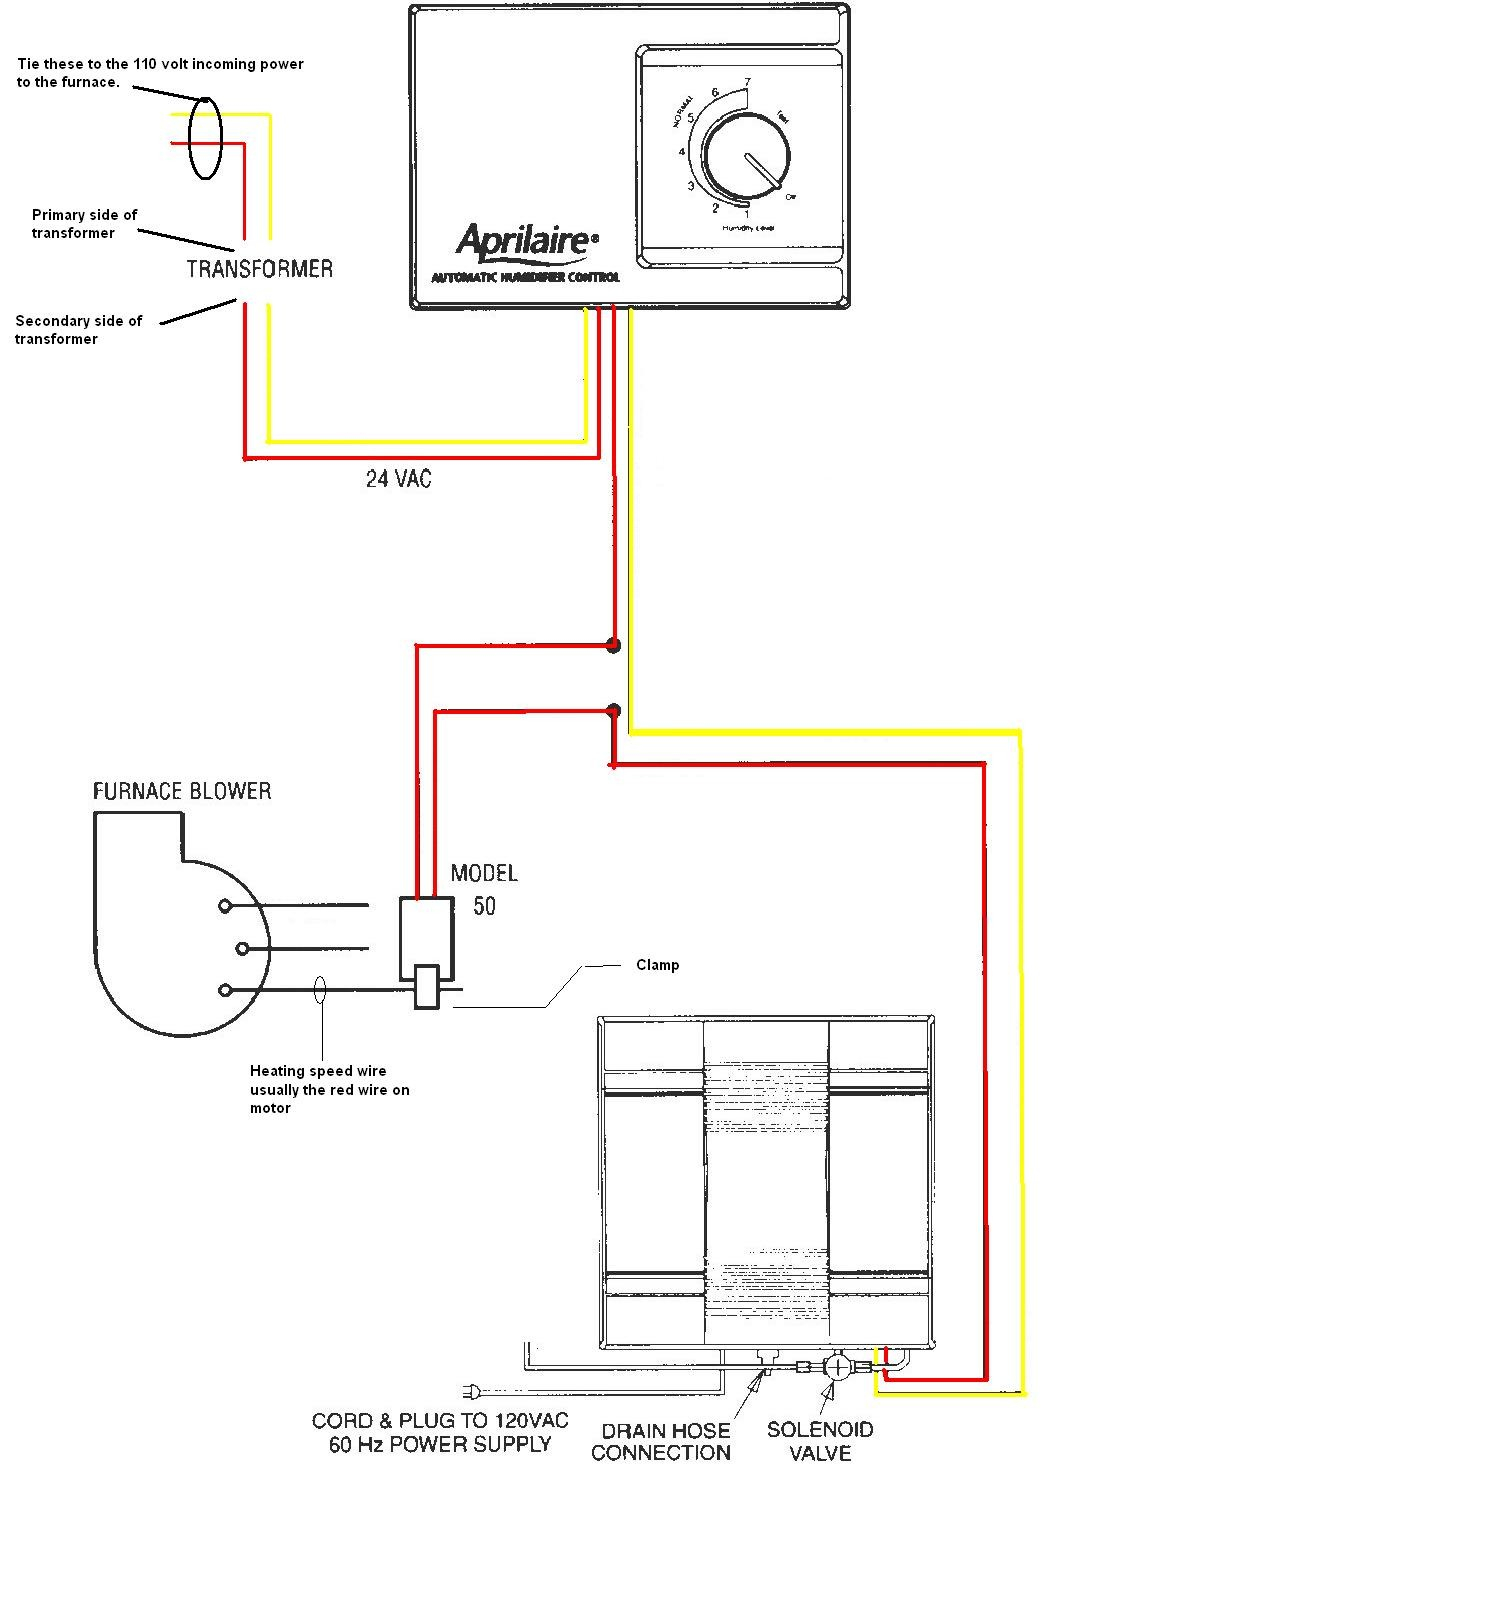 aprilaire 600 wiring diagram wiring diagram z4 rh 17 gvopl biologiethemenabitur de